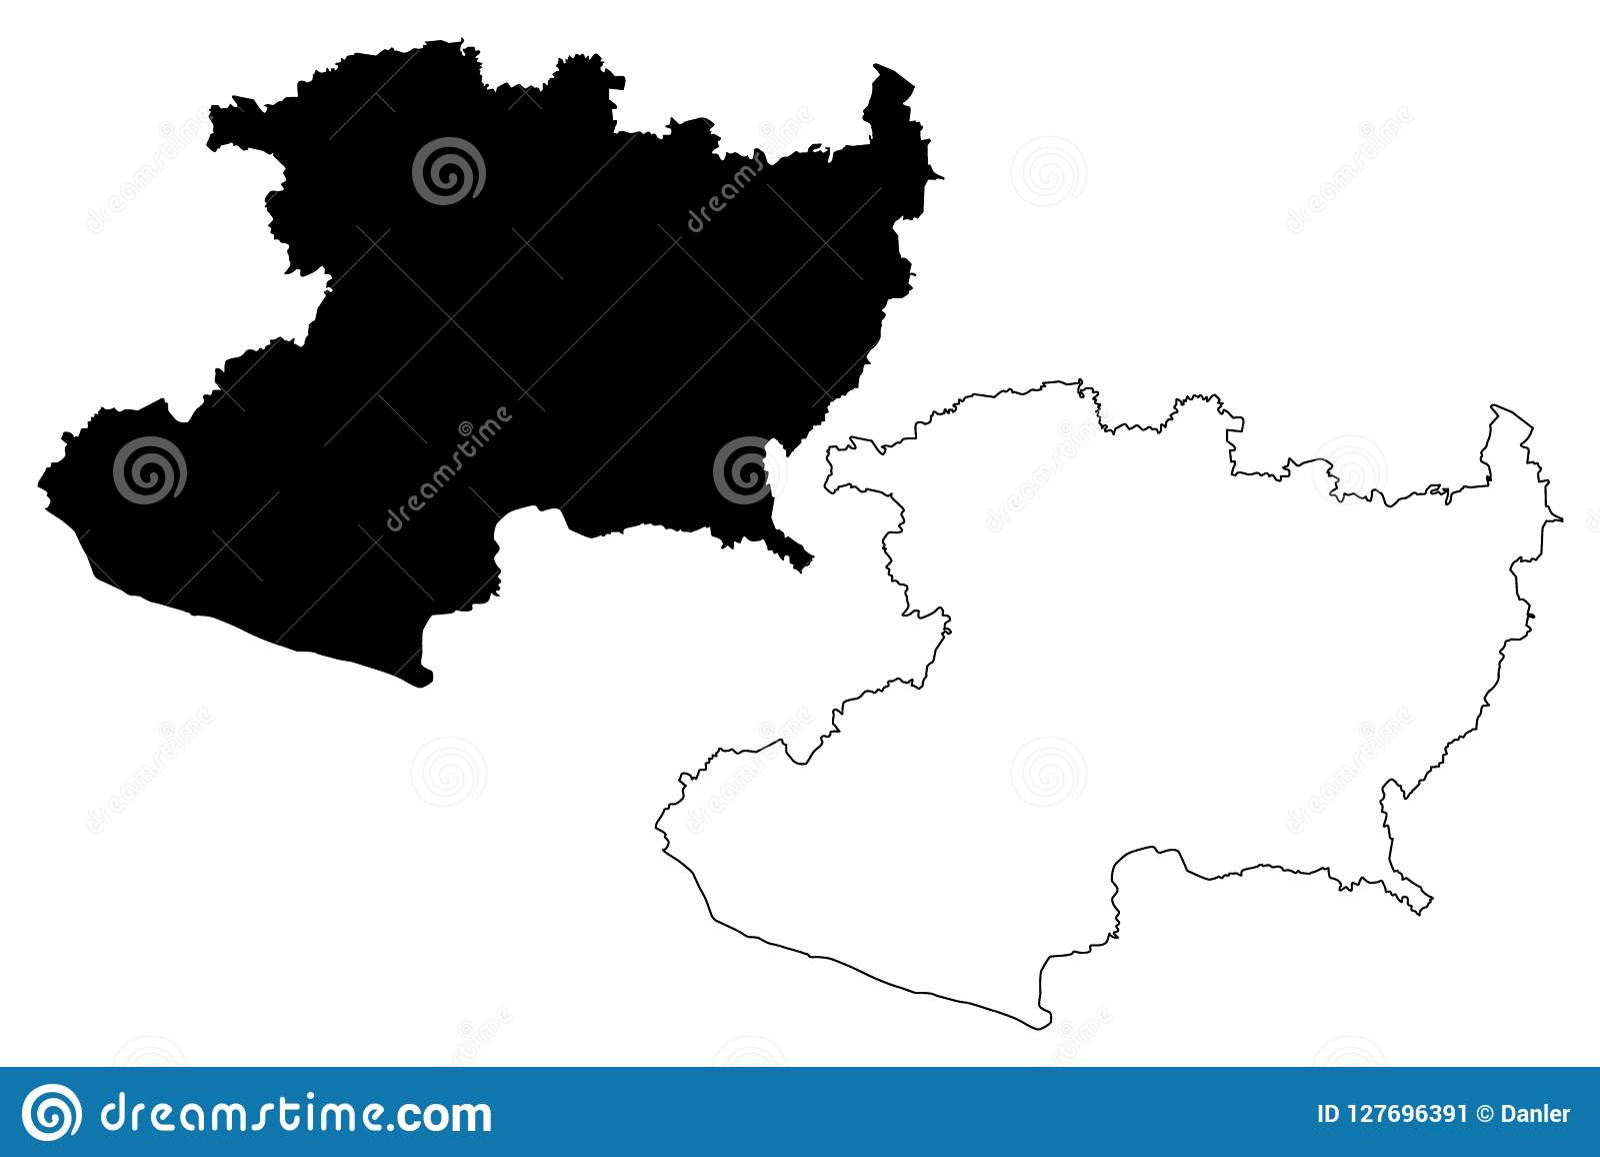 Michoacan Map Vector Stock Vector Illustration Of Icon 127696391